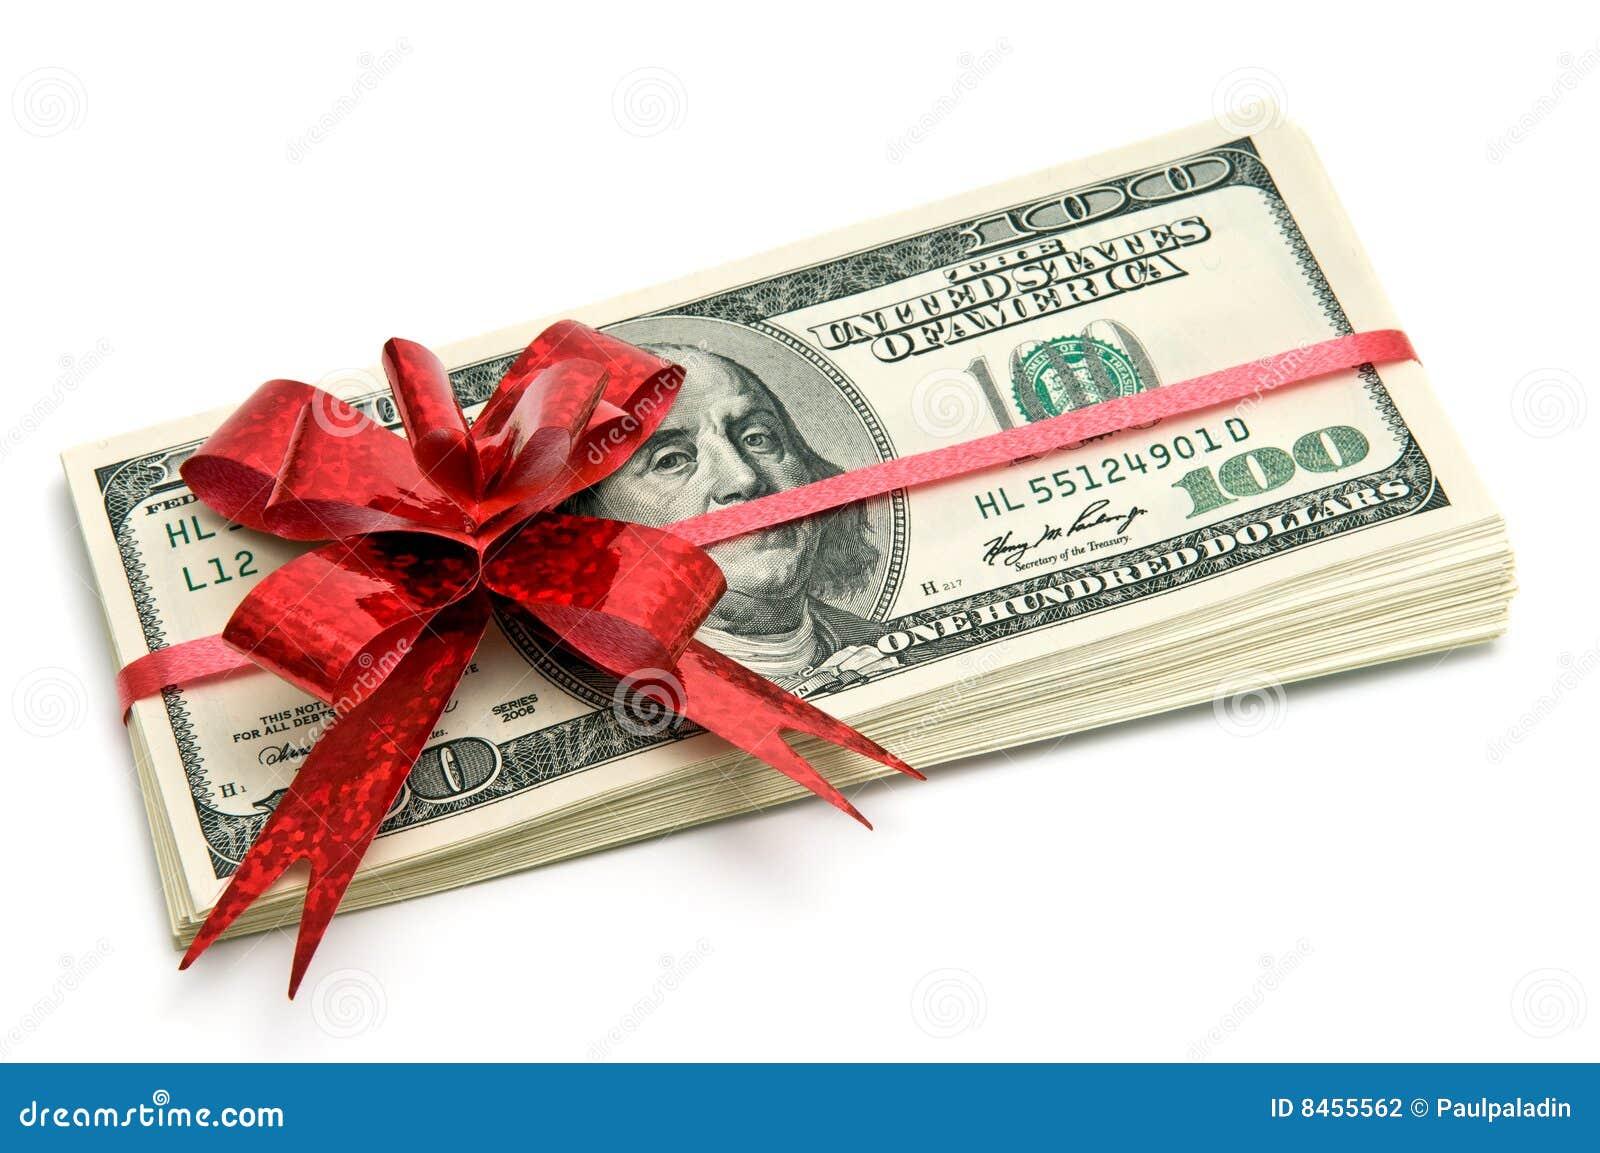 Travel Money Gift Card